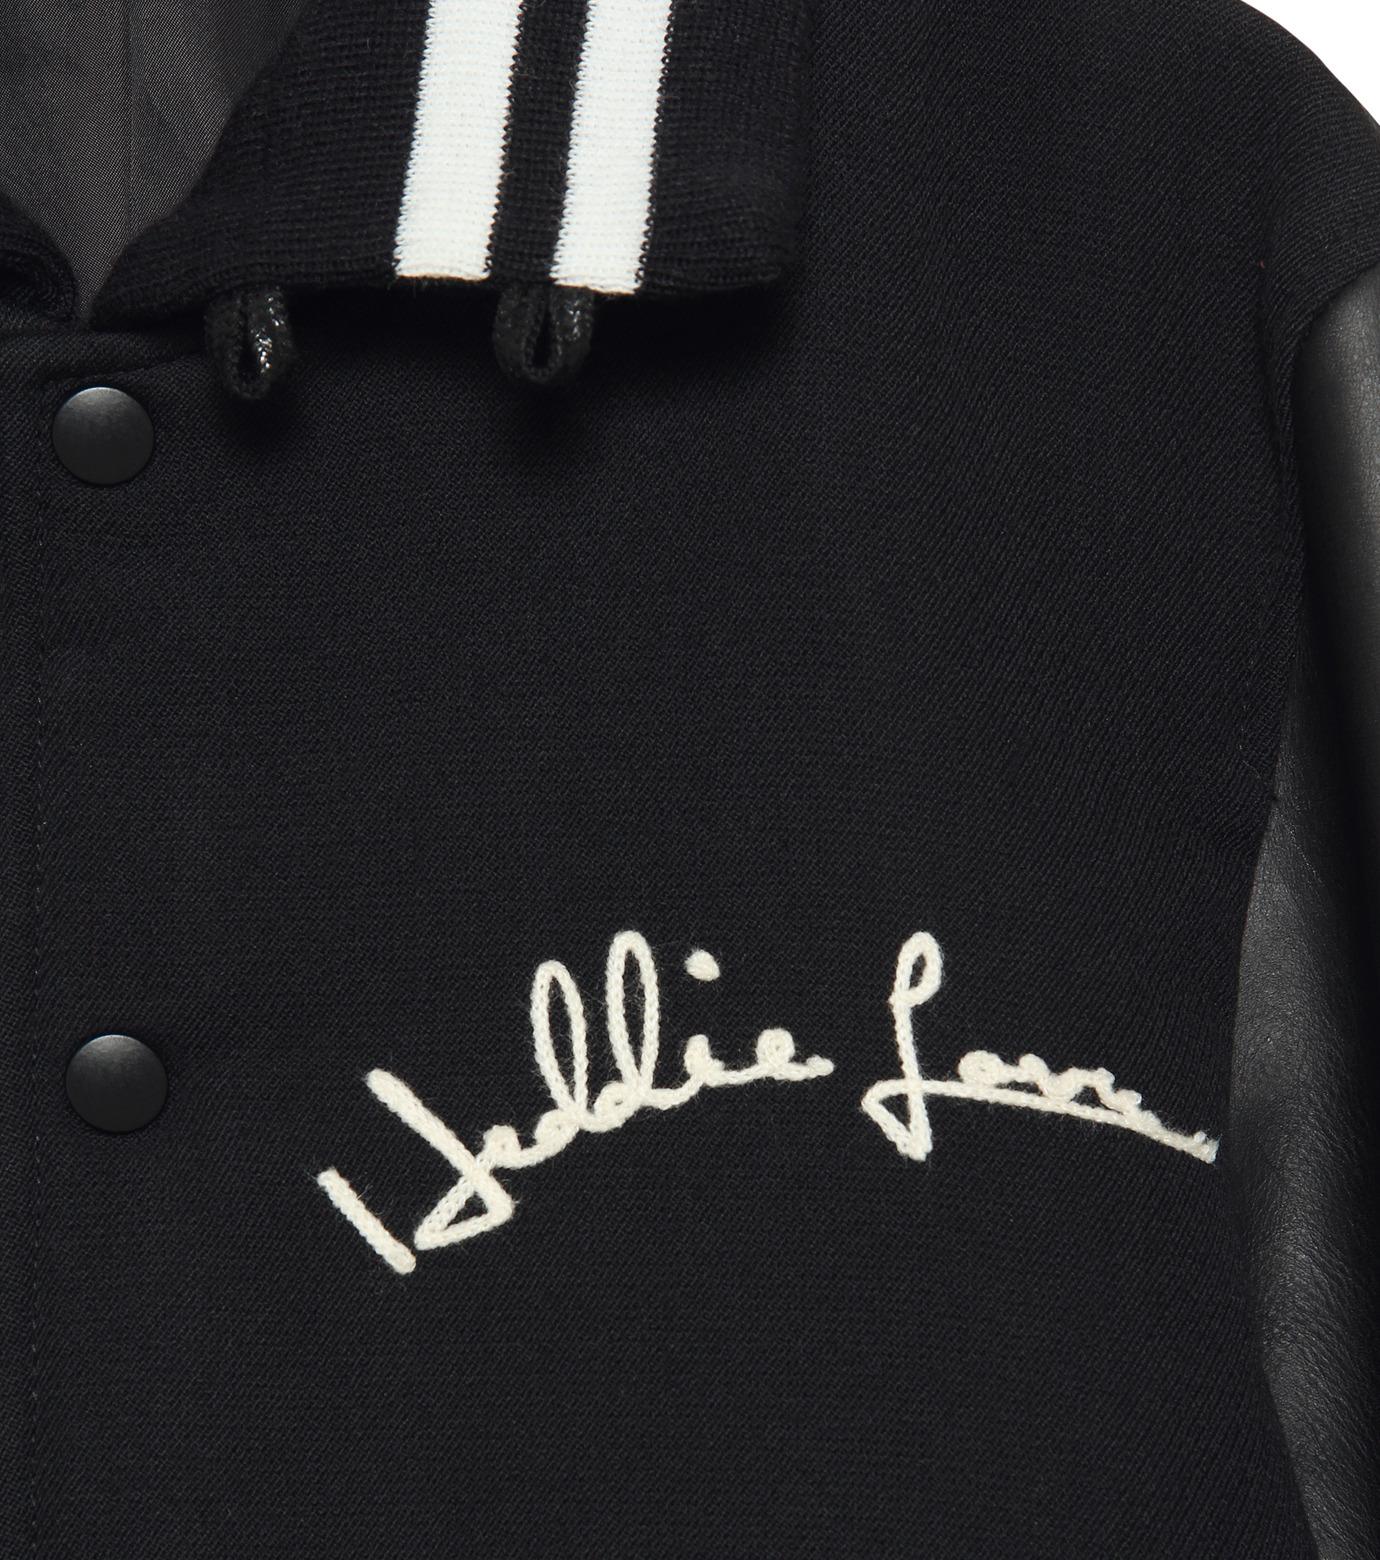 HL HEDDIE LOVU(エイチエル・エディールーヴ)のSTADIUM JACKET-BLACK(ジャケット/jacket)-18S94002-13 拡大詳細画像5